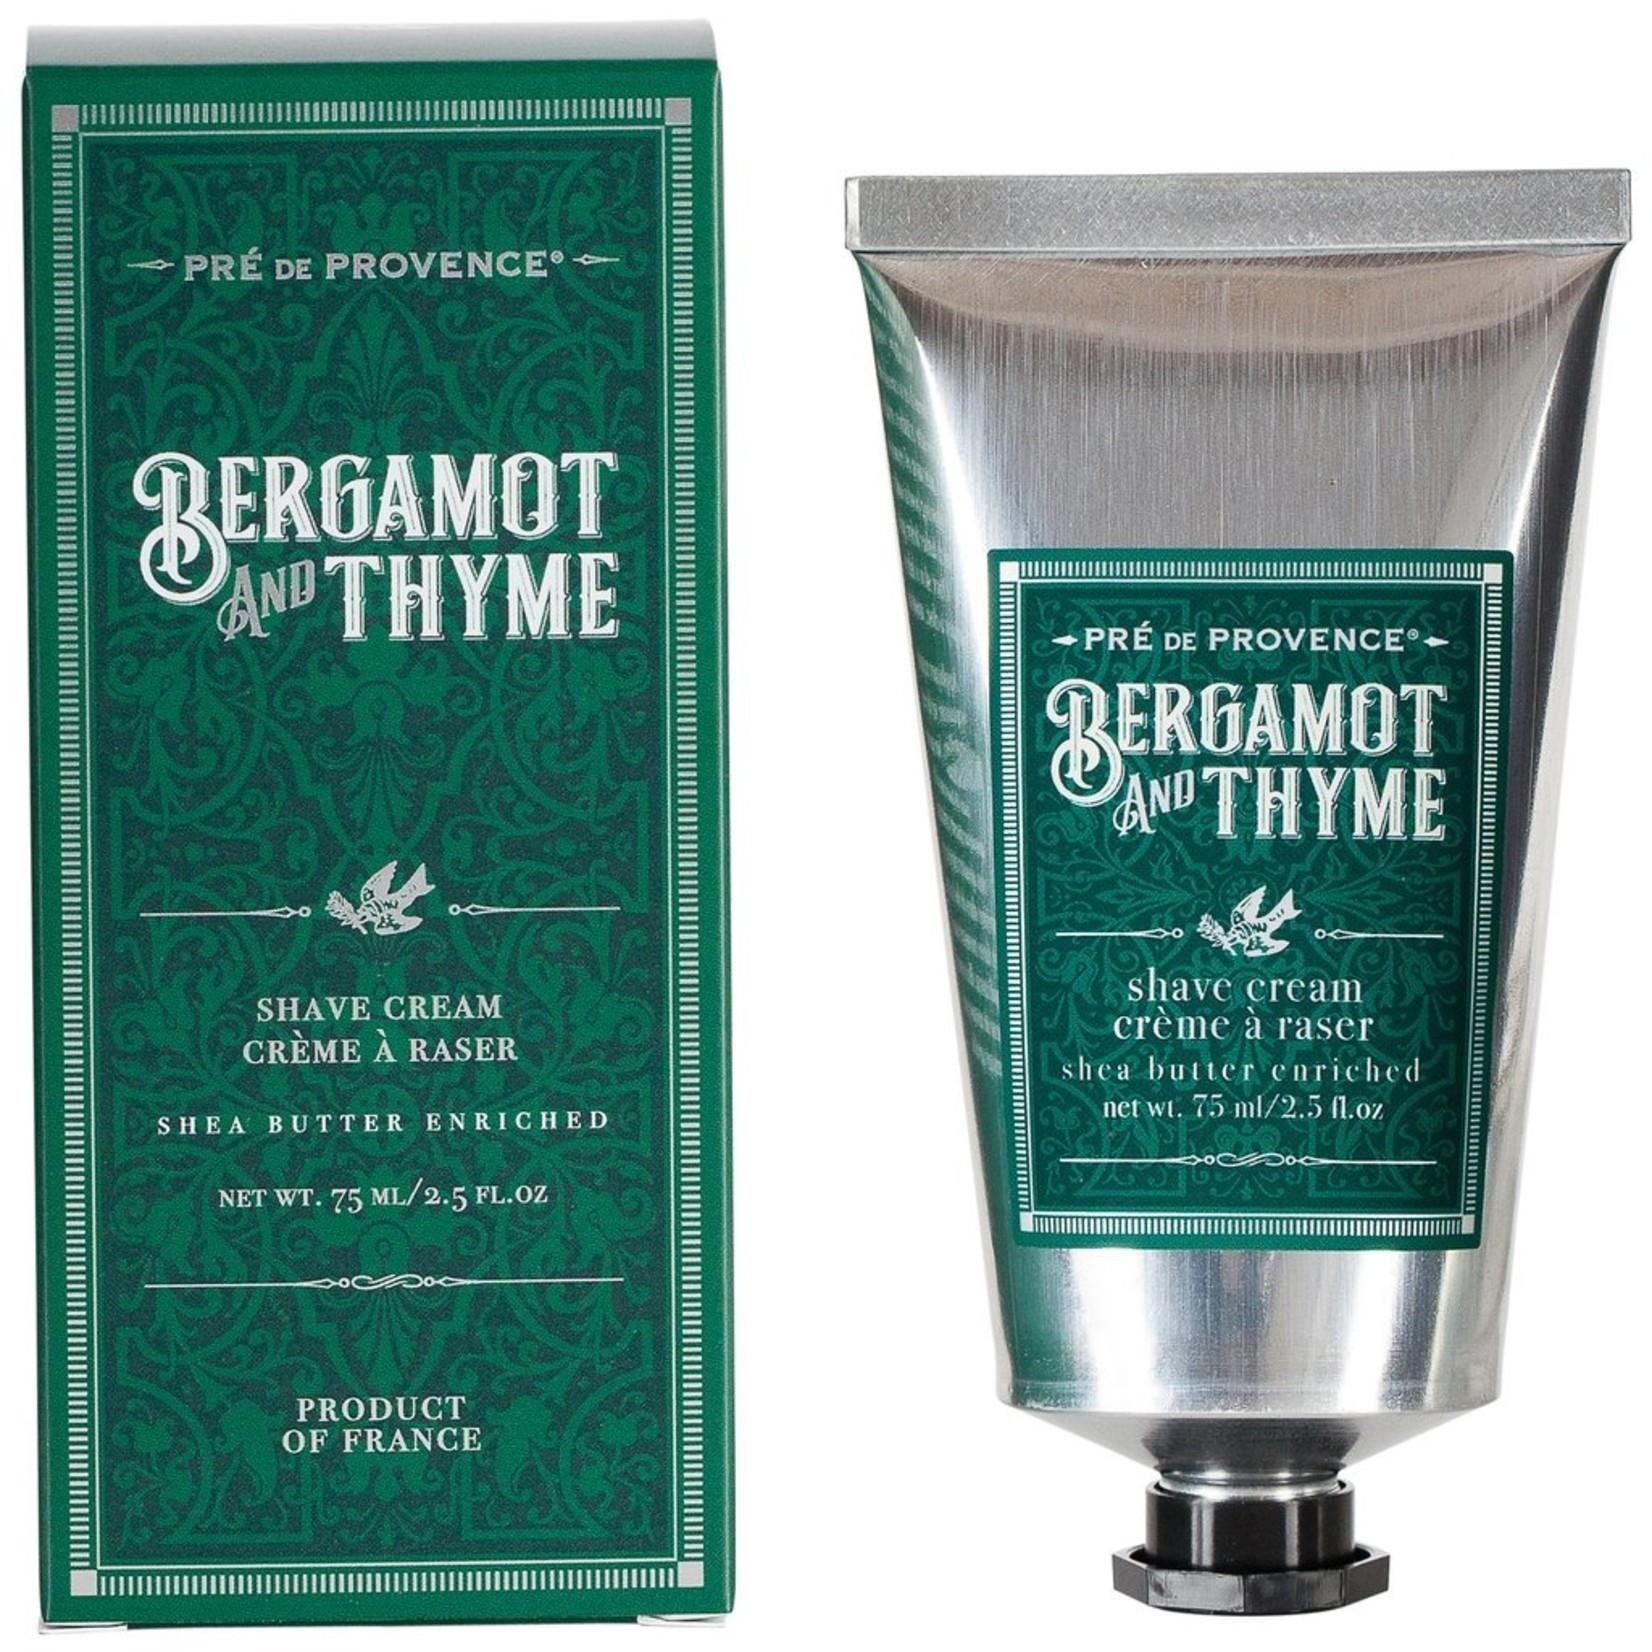 Pre de Provence Bergamot & Thyme Shea Butter Shave Cream